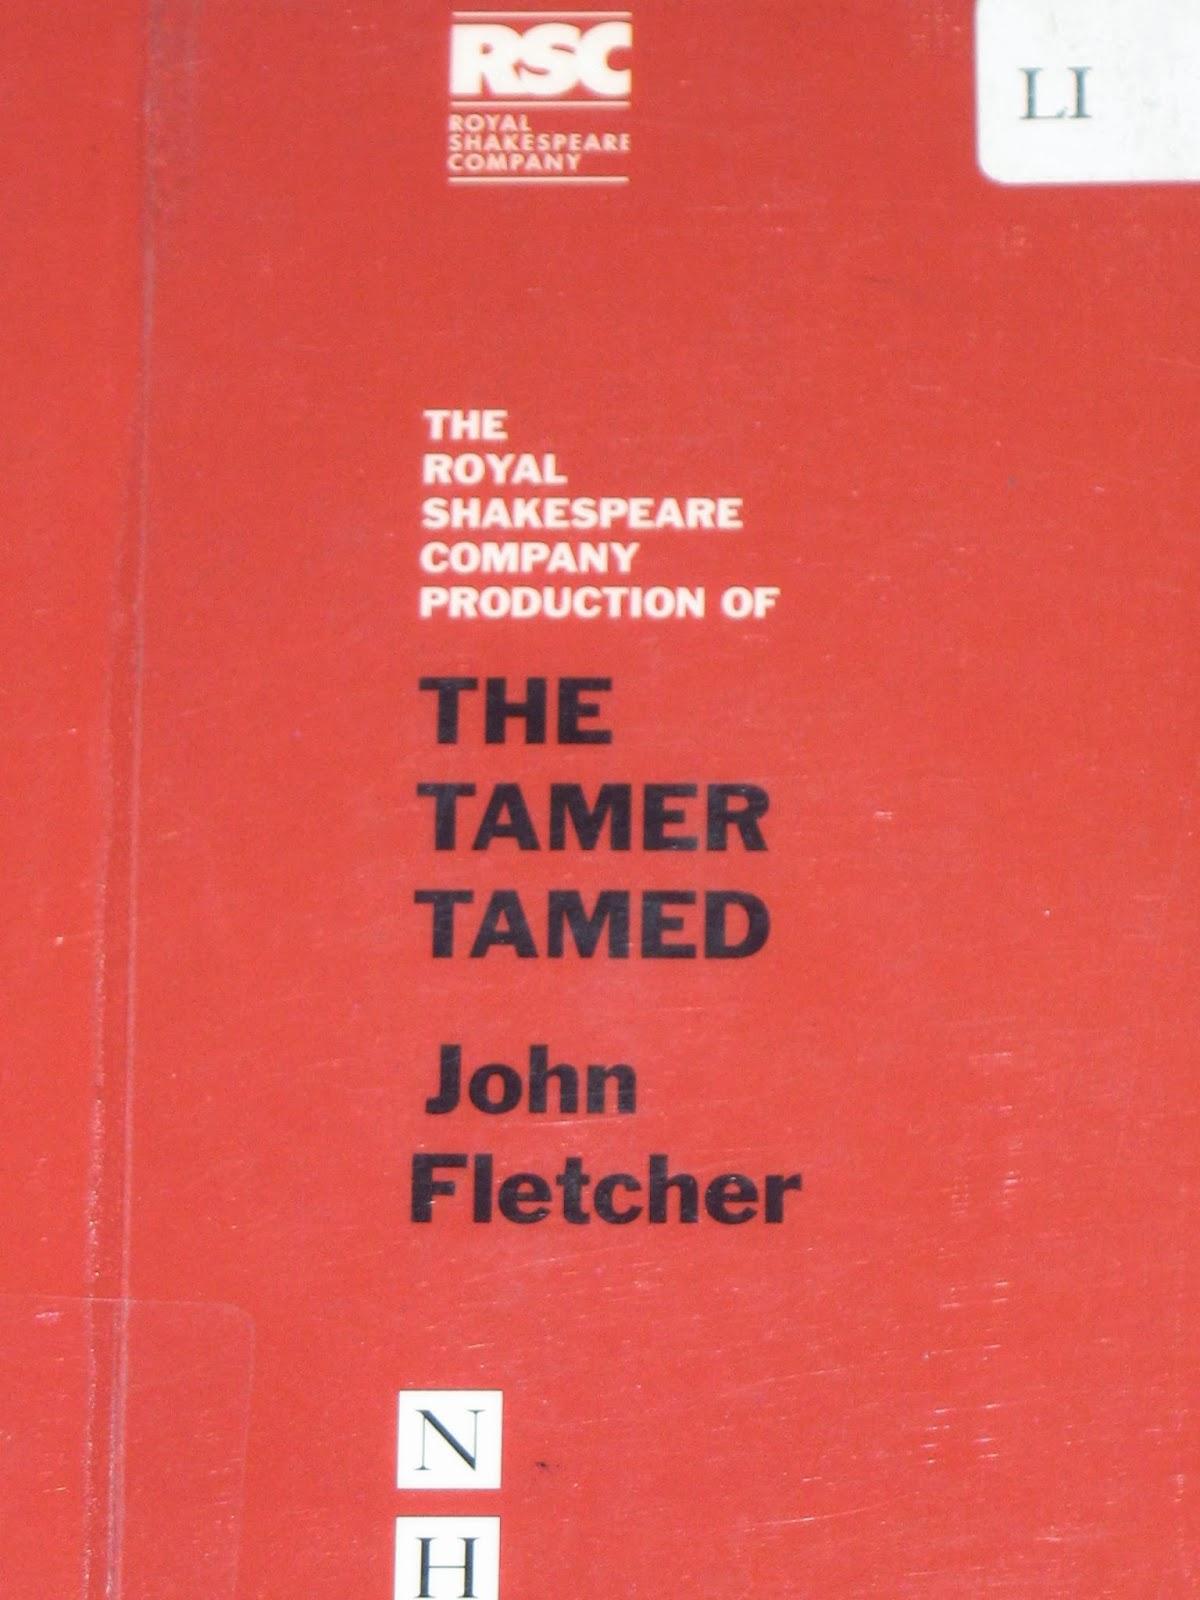 taming of the shrew essays katharina s development reportd202 taming of the shrew essays katharina s development